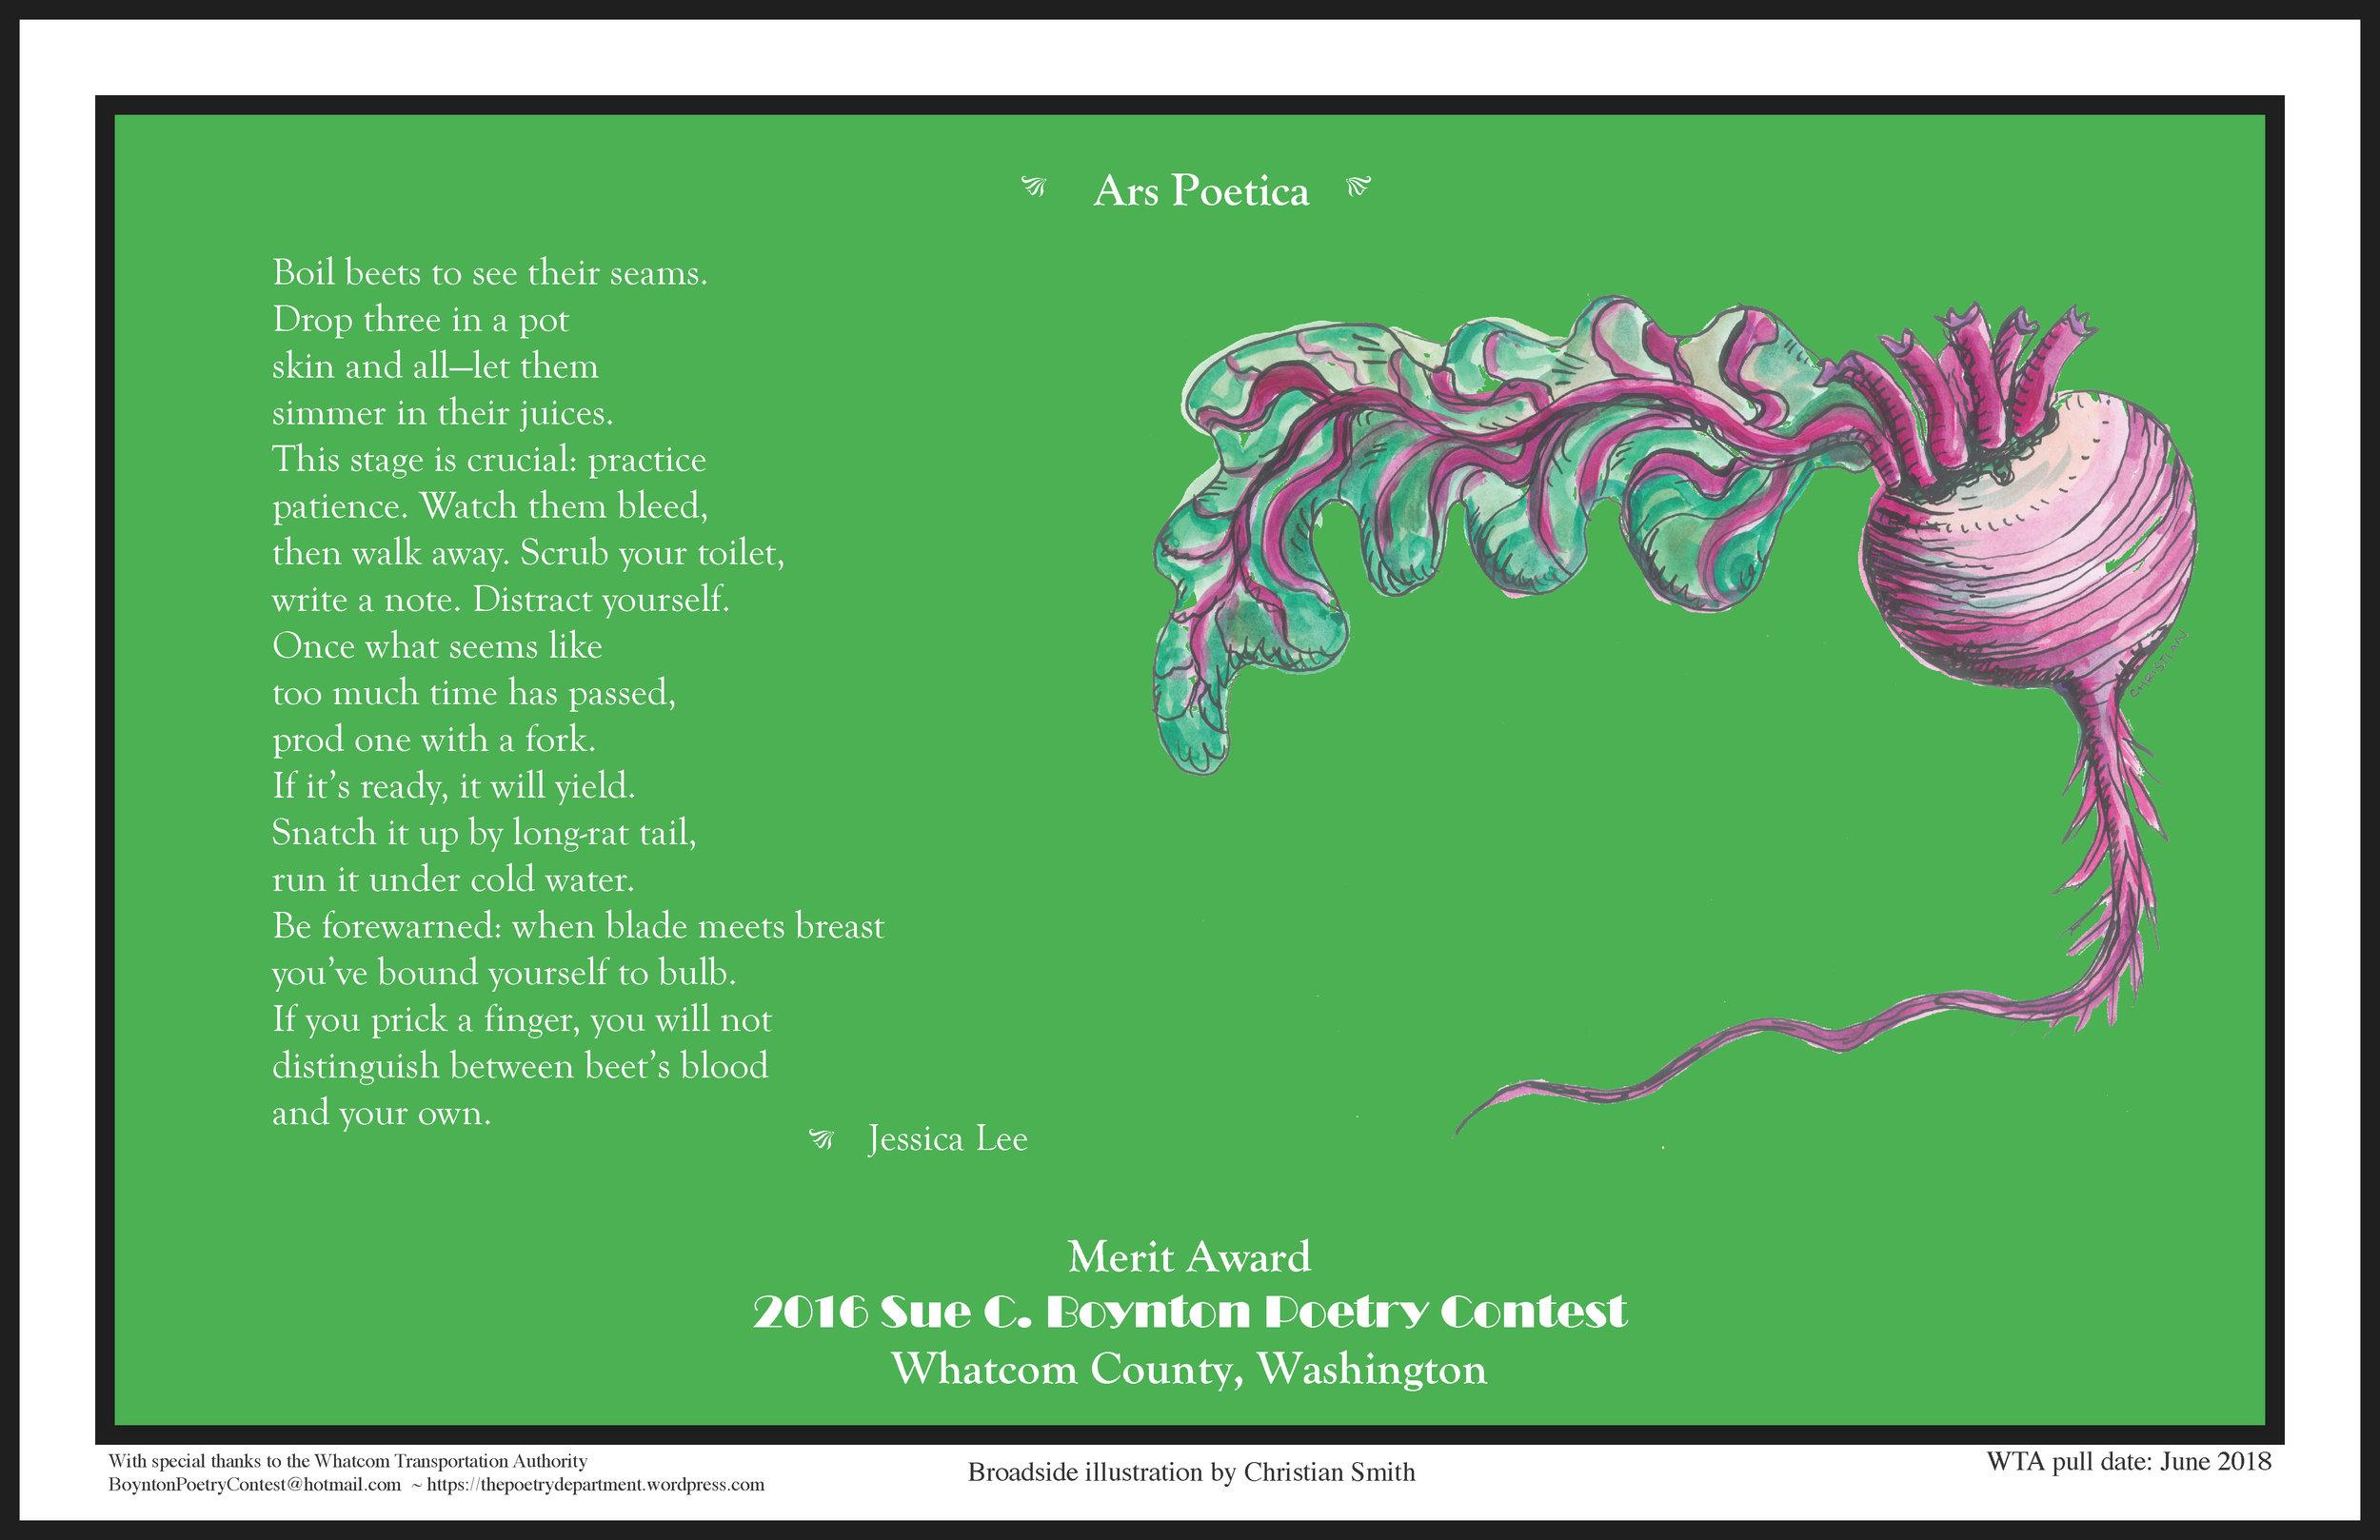 Ars Poetica-Jessica Lee.jpg